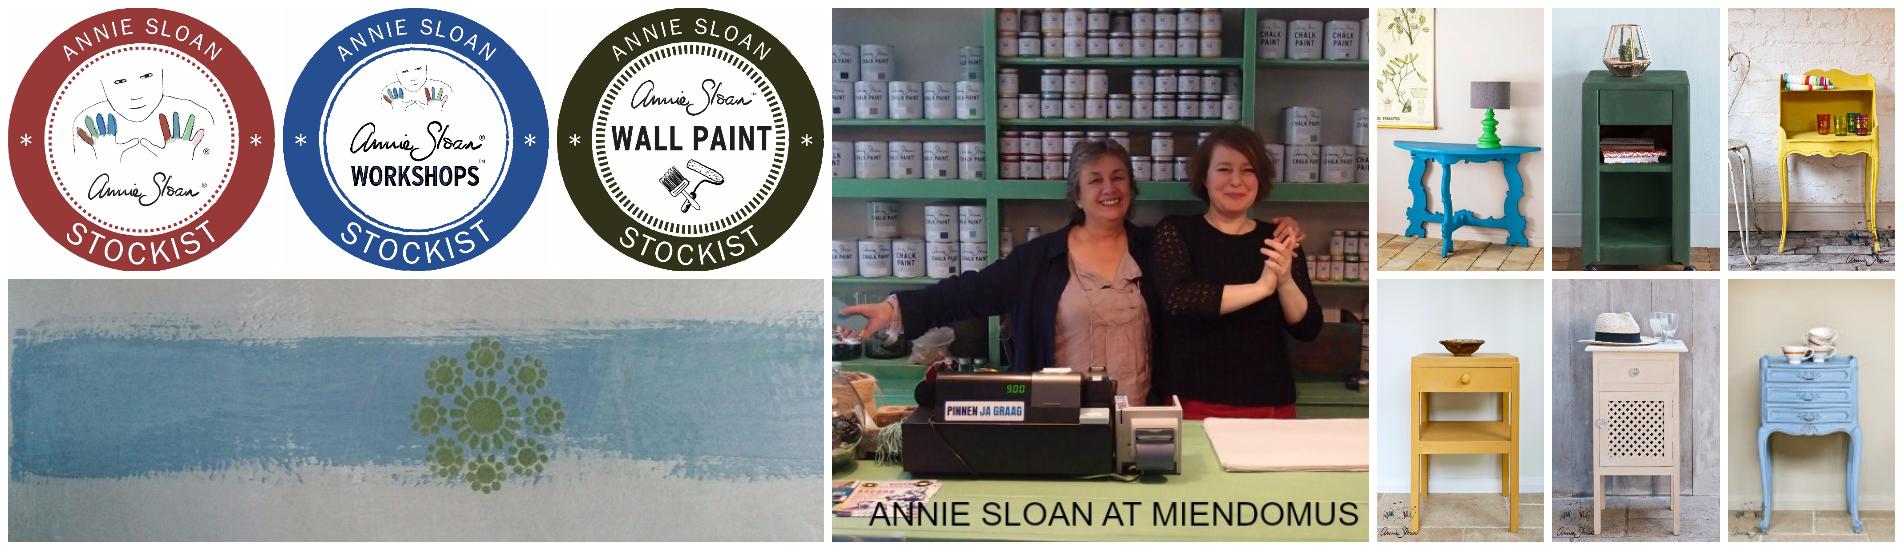 banner-annie-sloan-chalk-paint